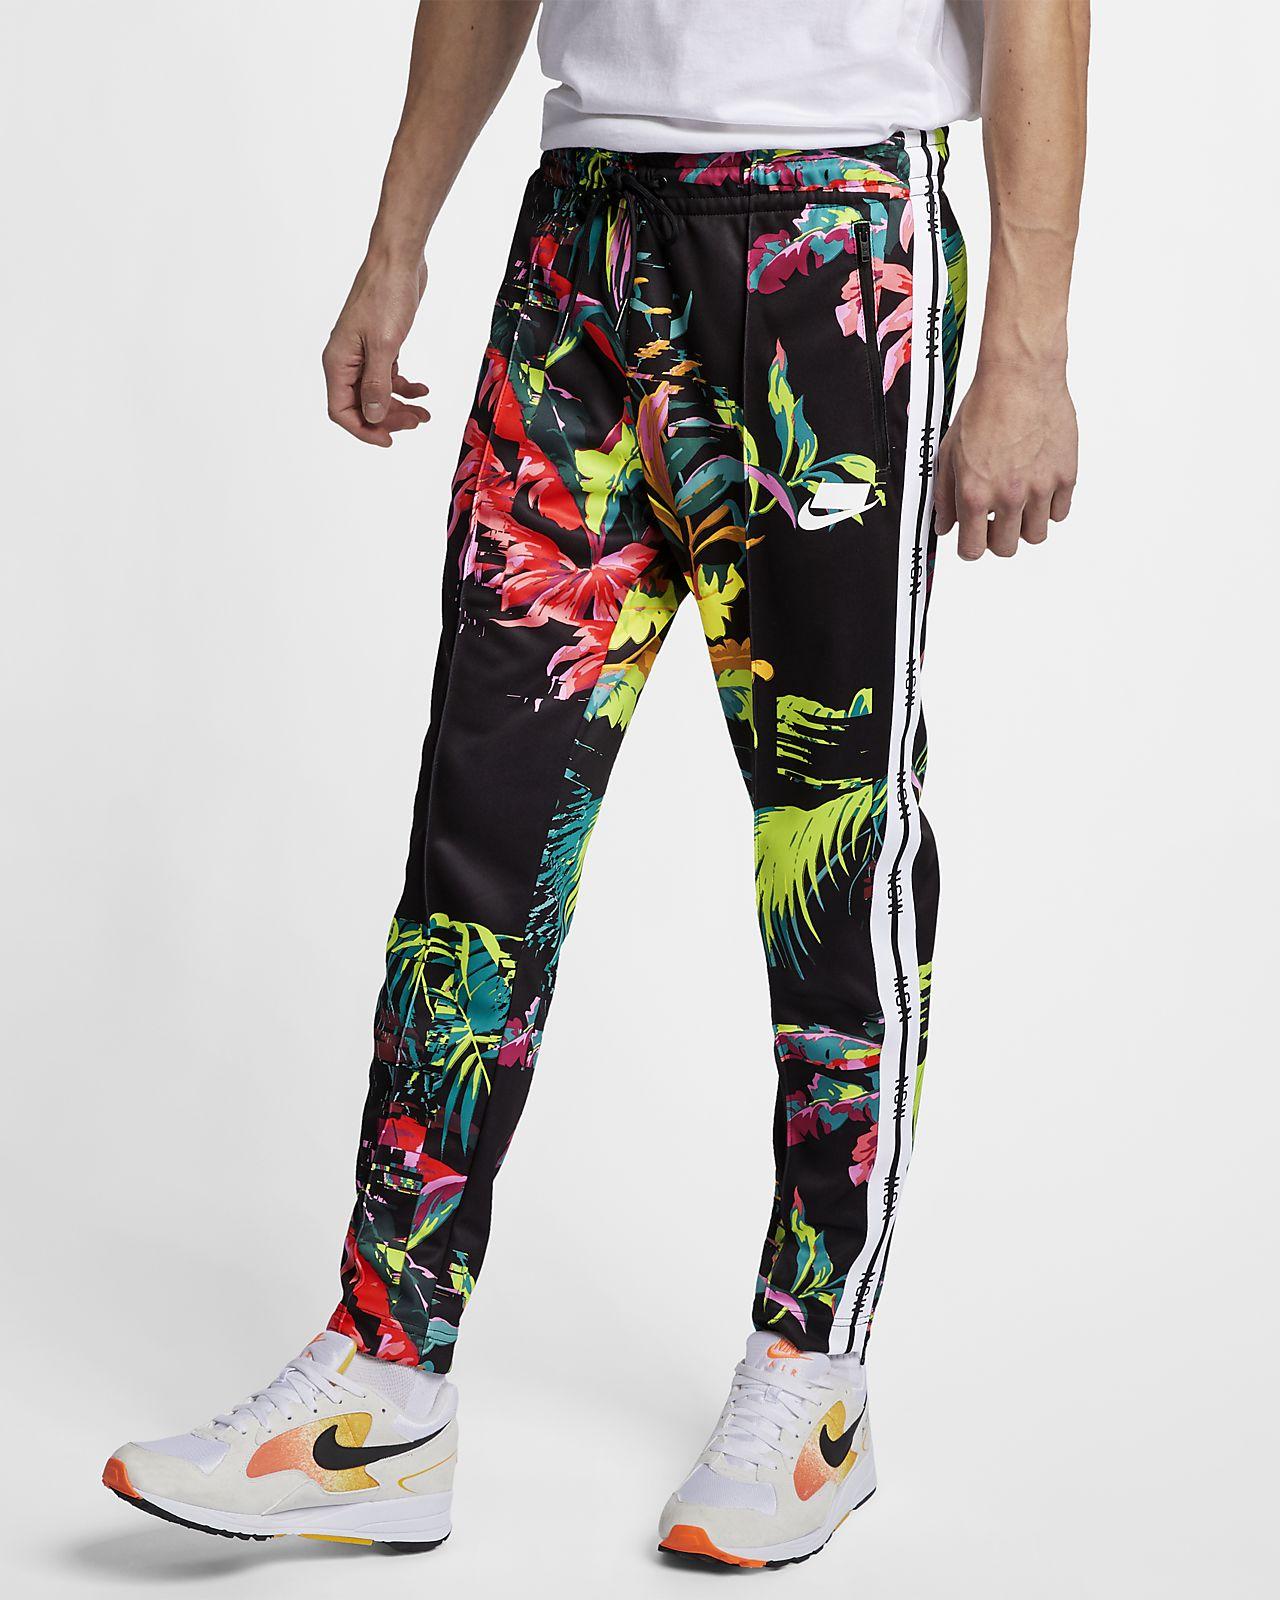 Esportius Home Nike Sportswear Pantalons Nsw Es qBnSzxatSw